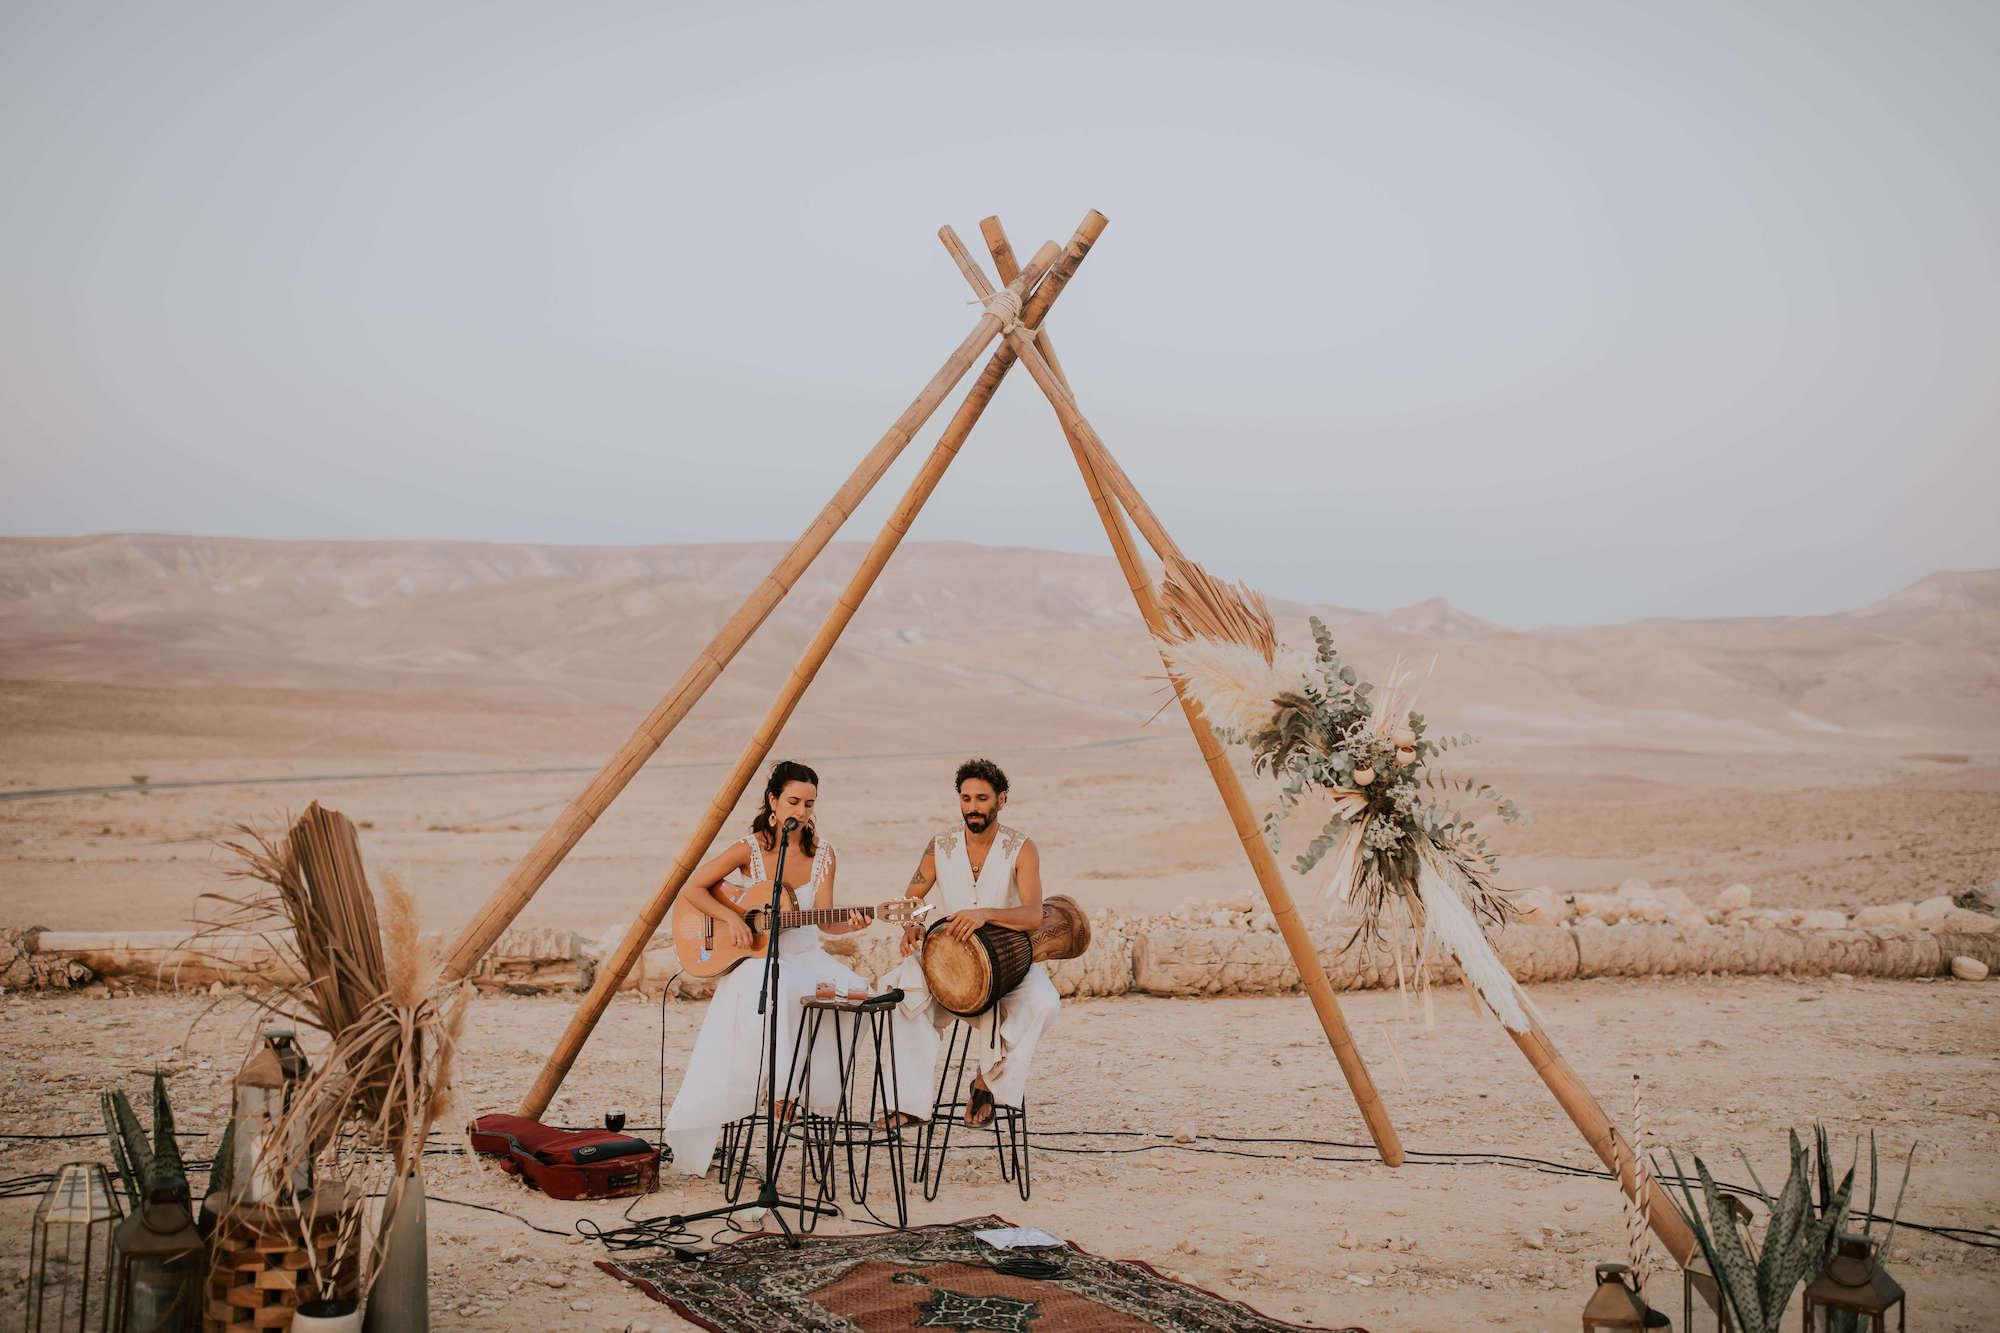 sunset to sunrise: פסטיבל חתונה בכפר הנוקדים